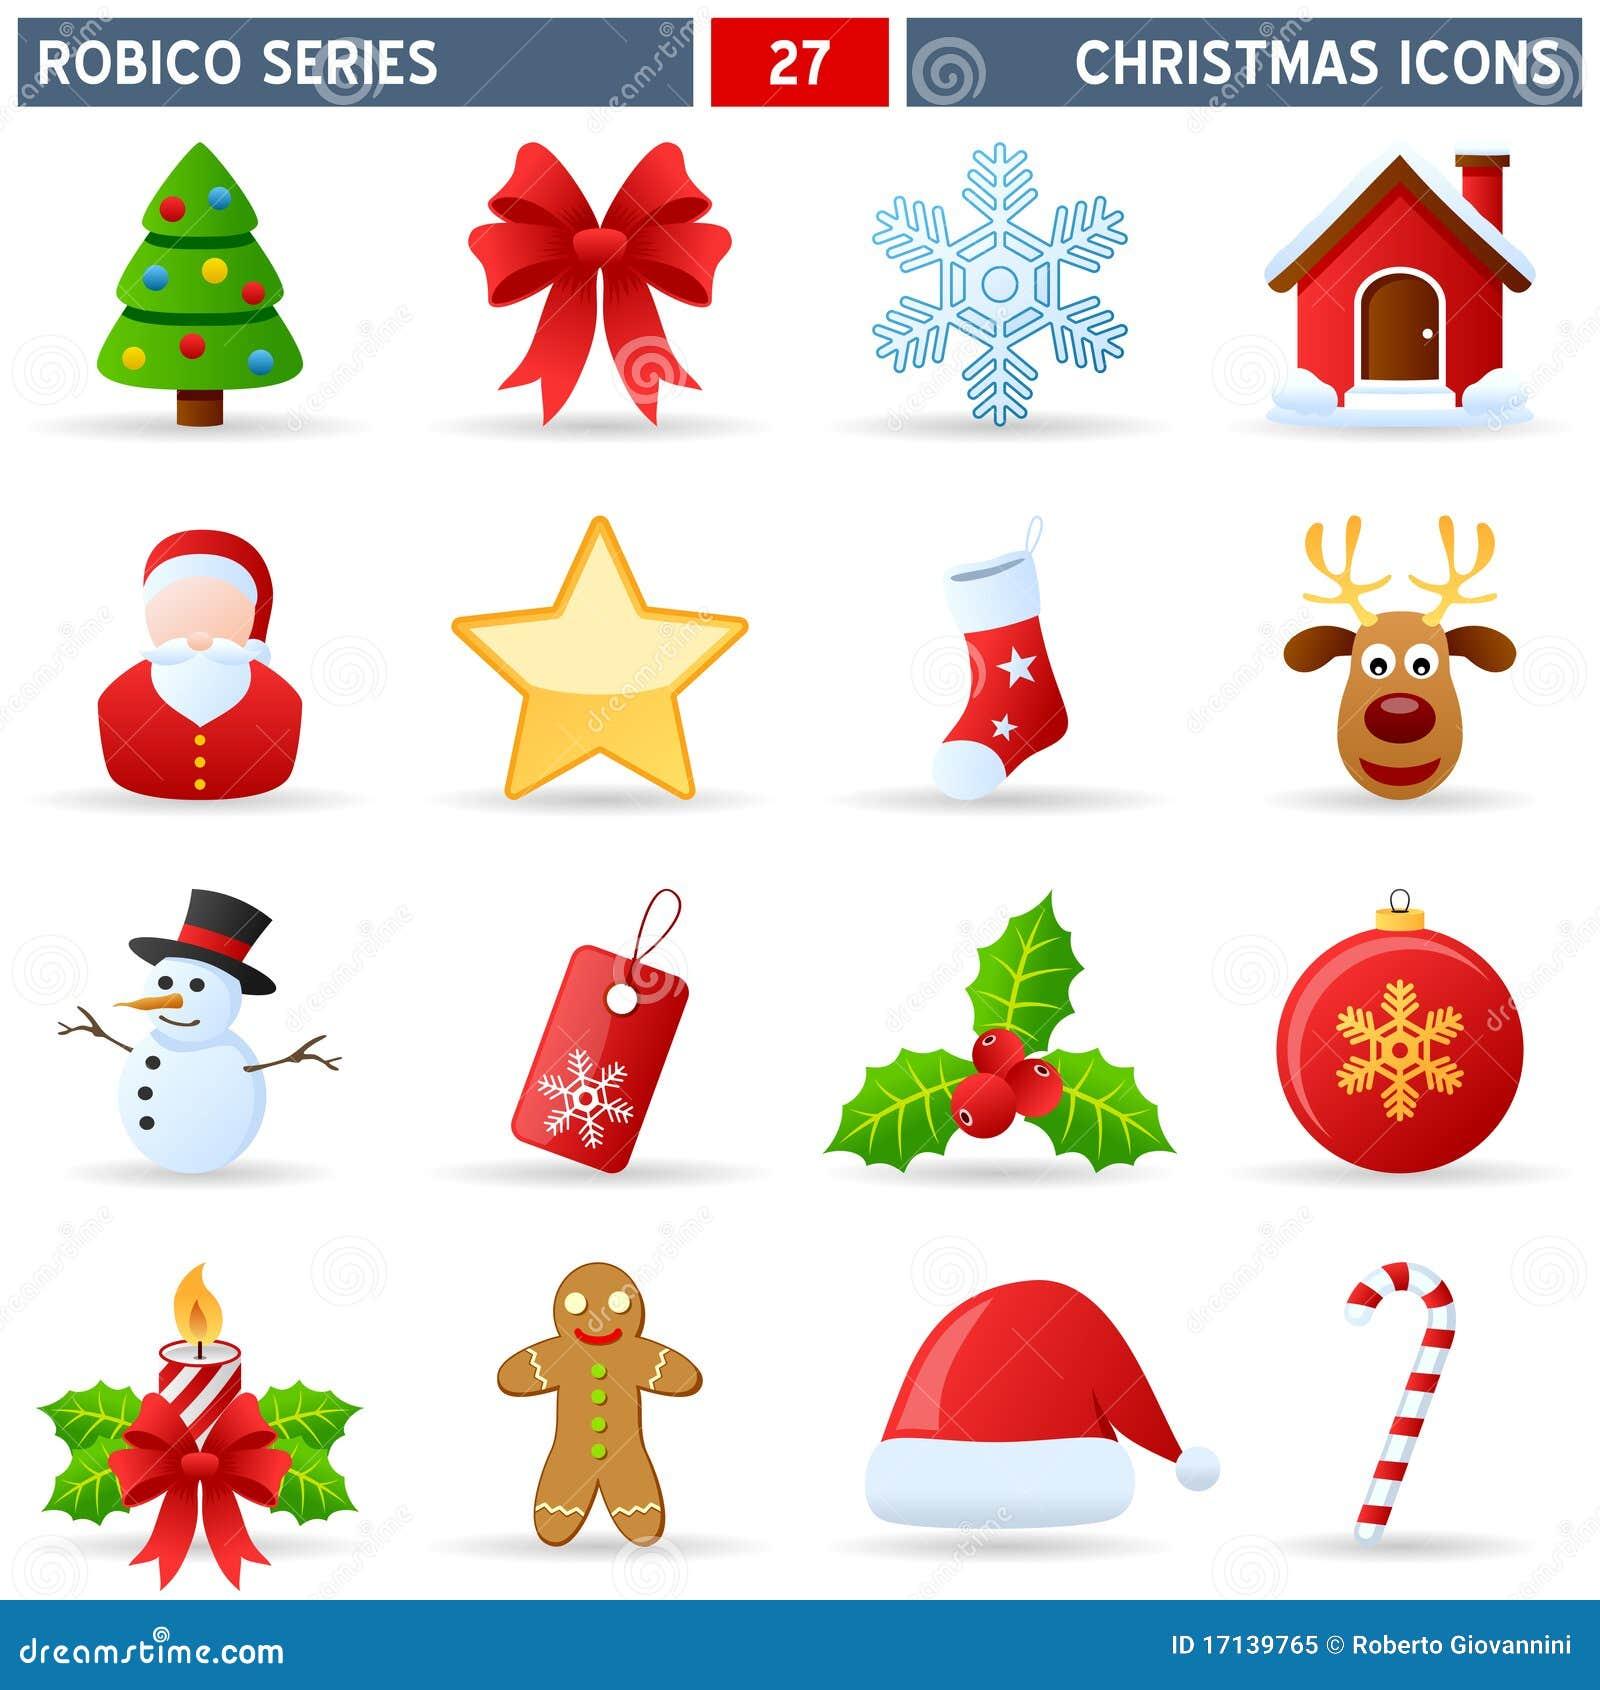 Graphismes de Noël - série de Robico